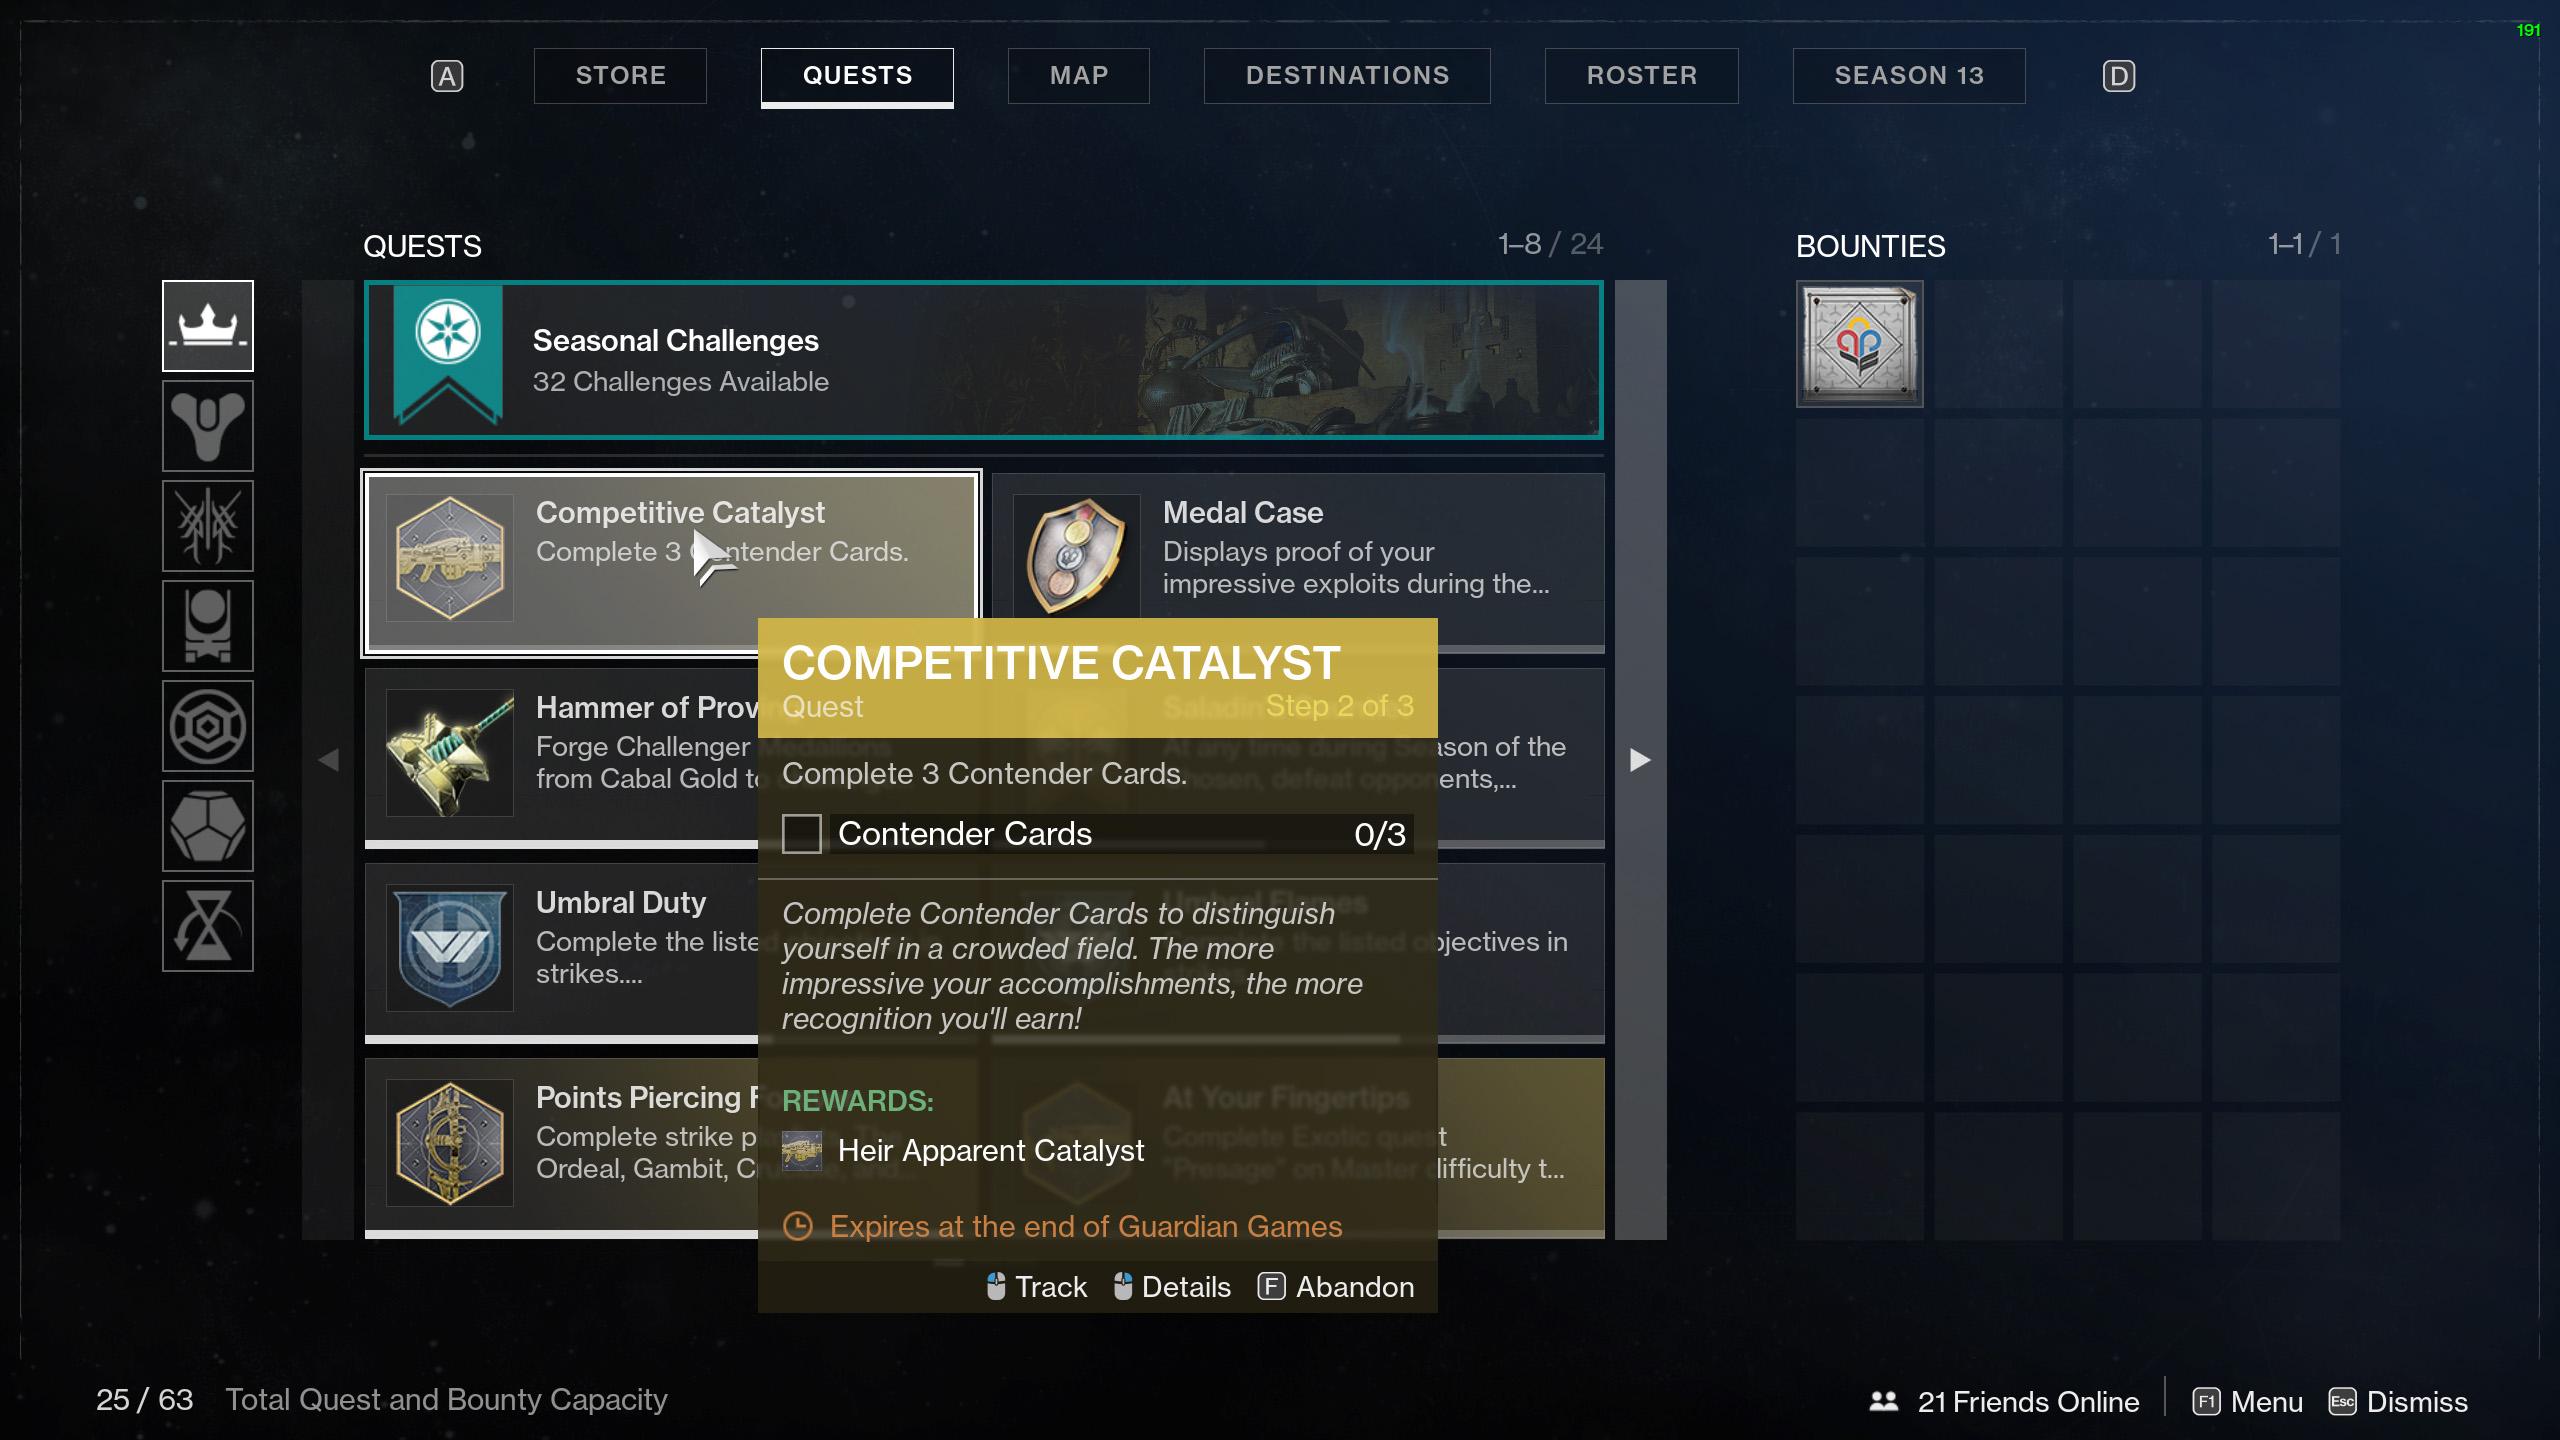 destiny 2 heir apparent catalyst